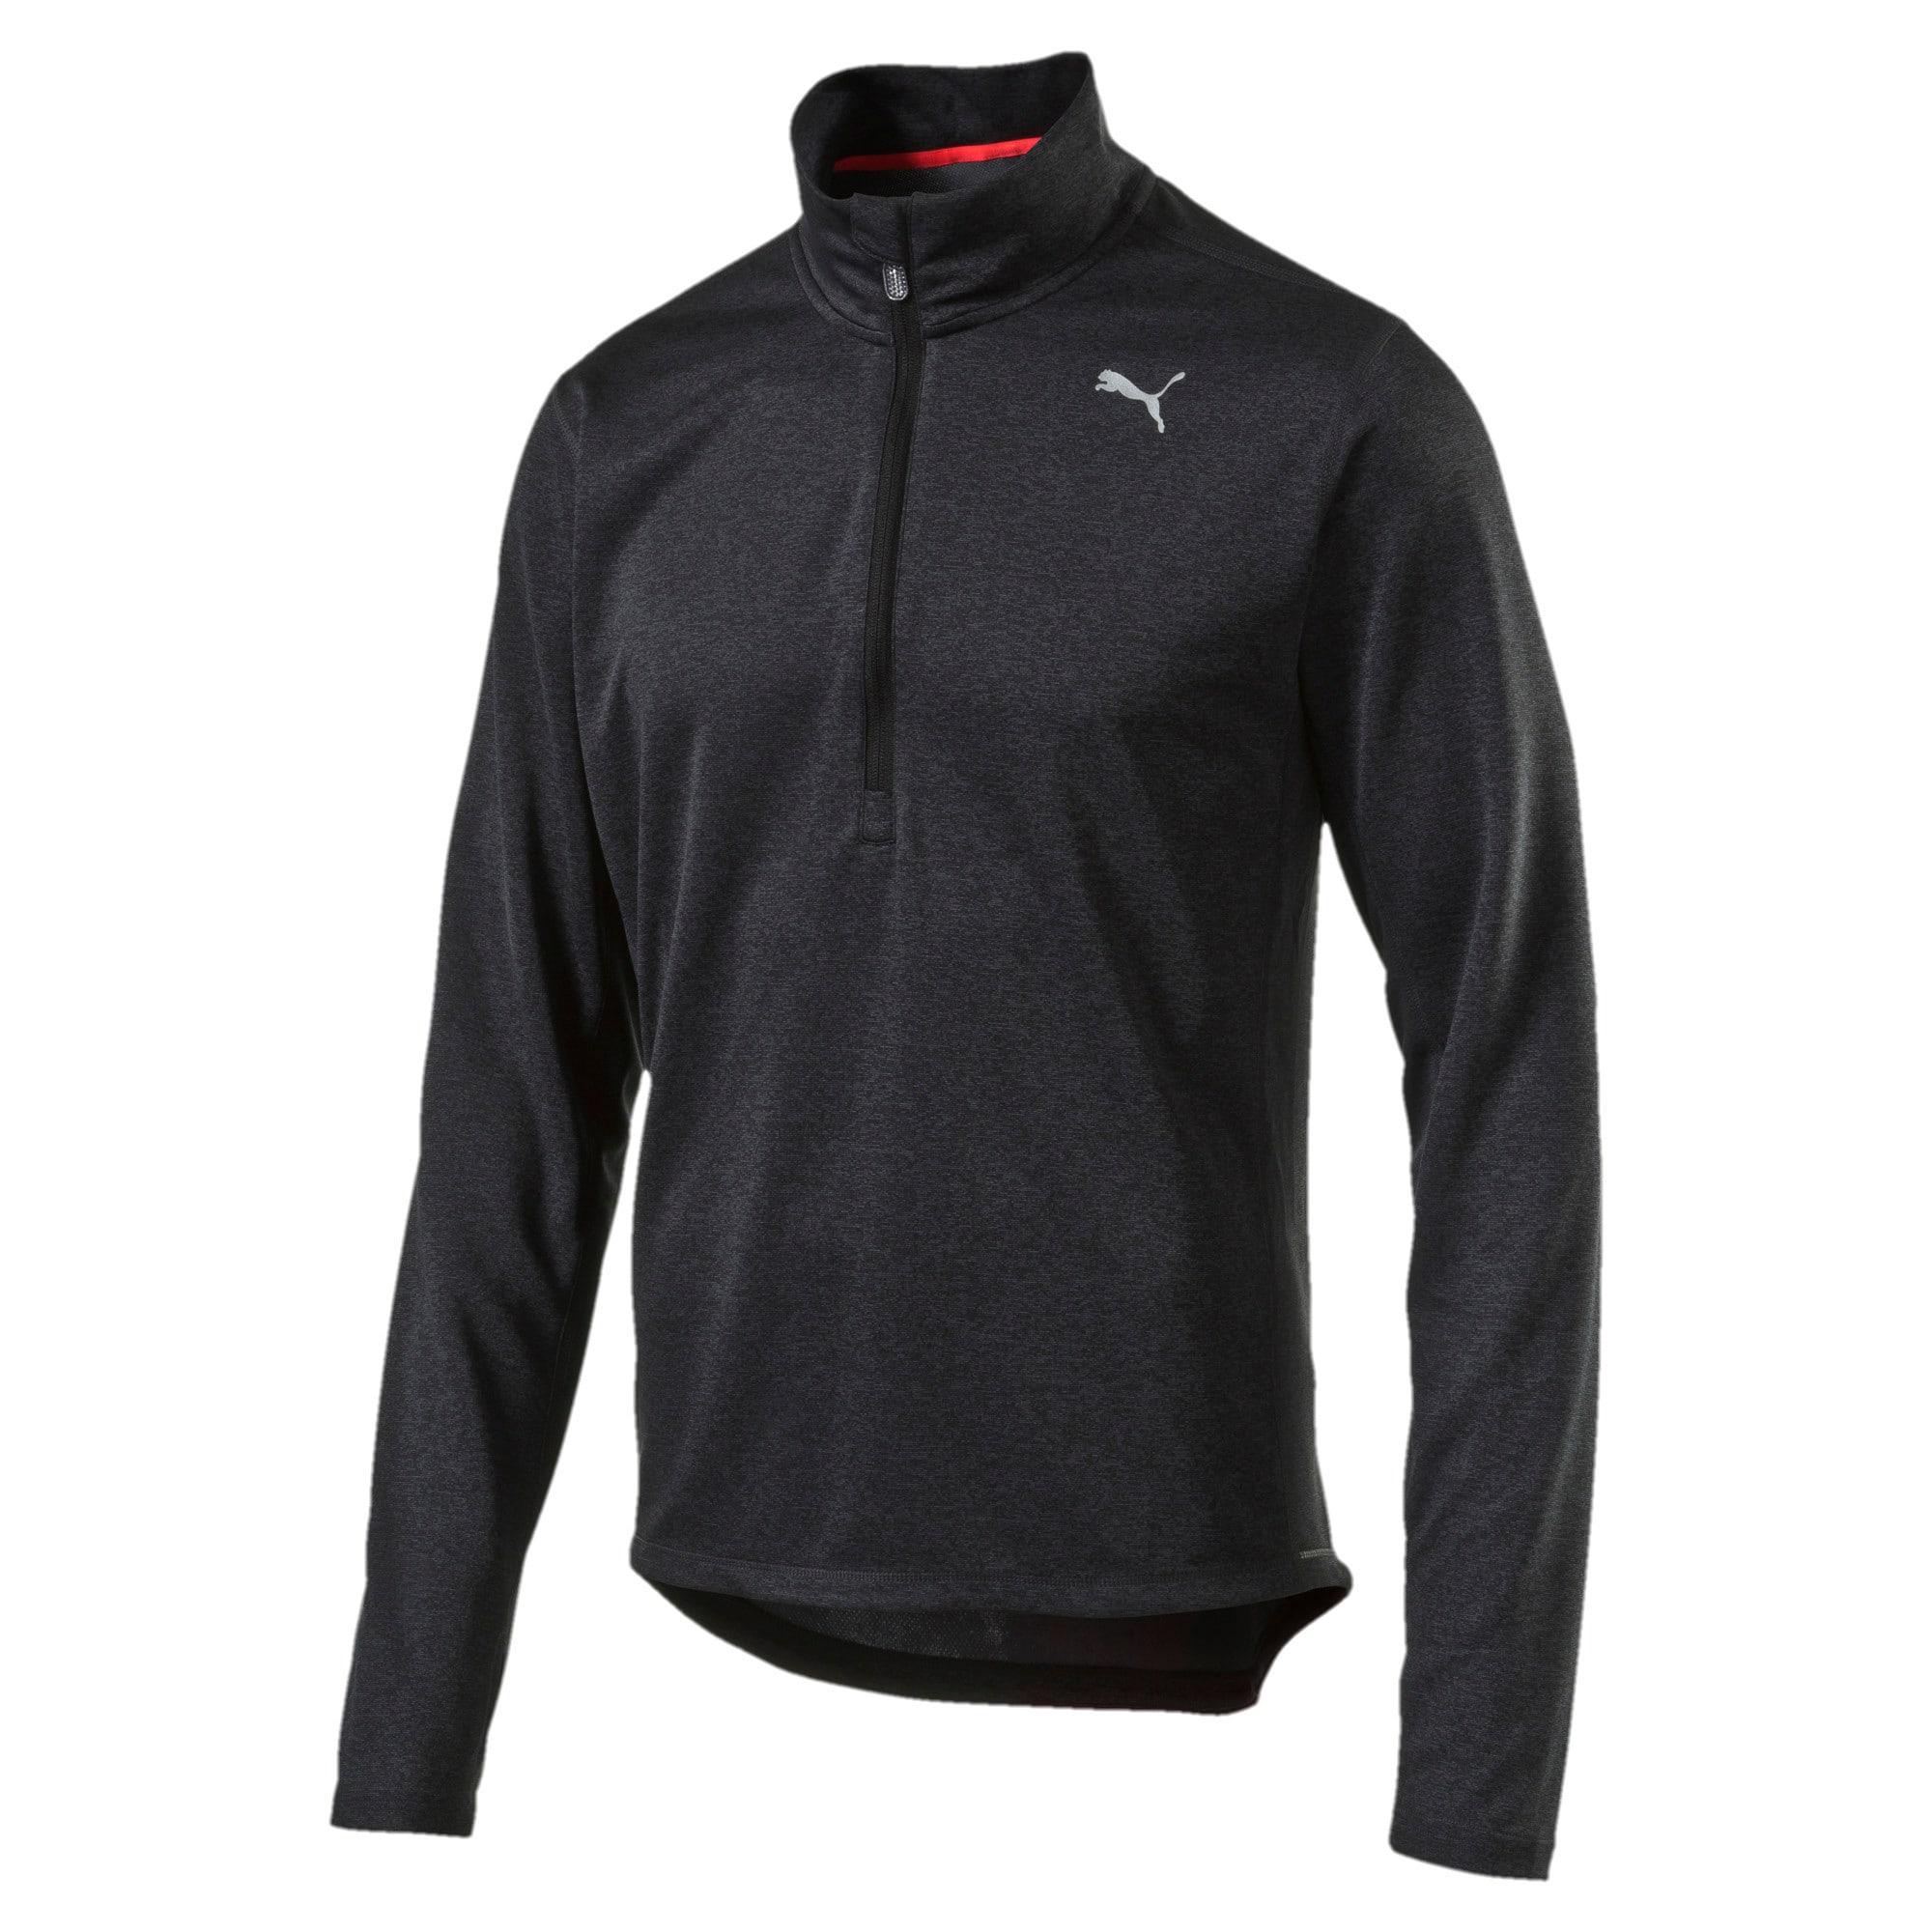 Thumbnail 3 of Running Men's Half Zip Long Sleeve, Black Heather-dtm stitching, medium-IND